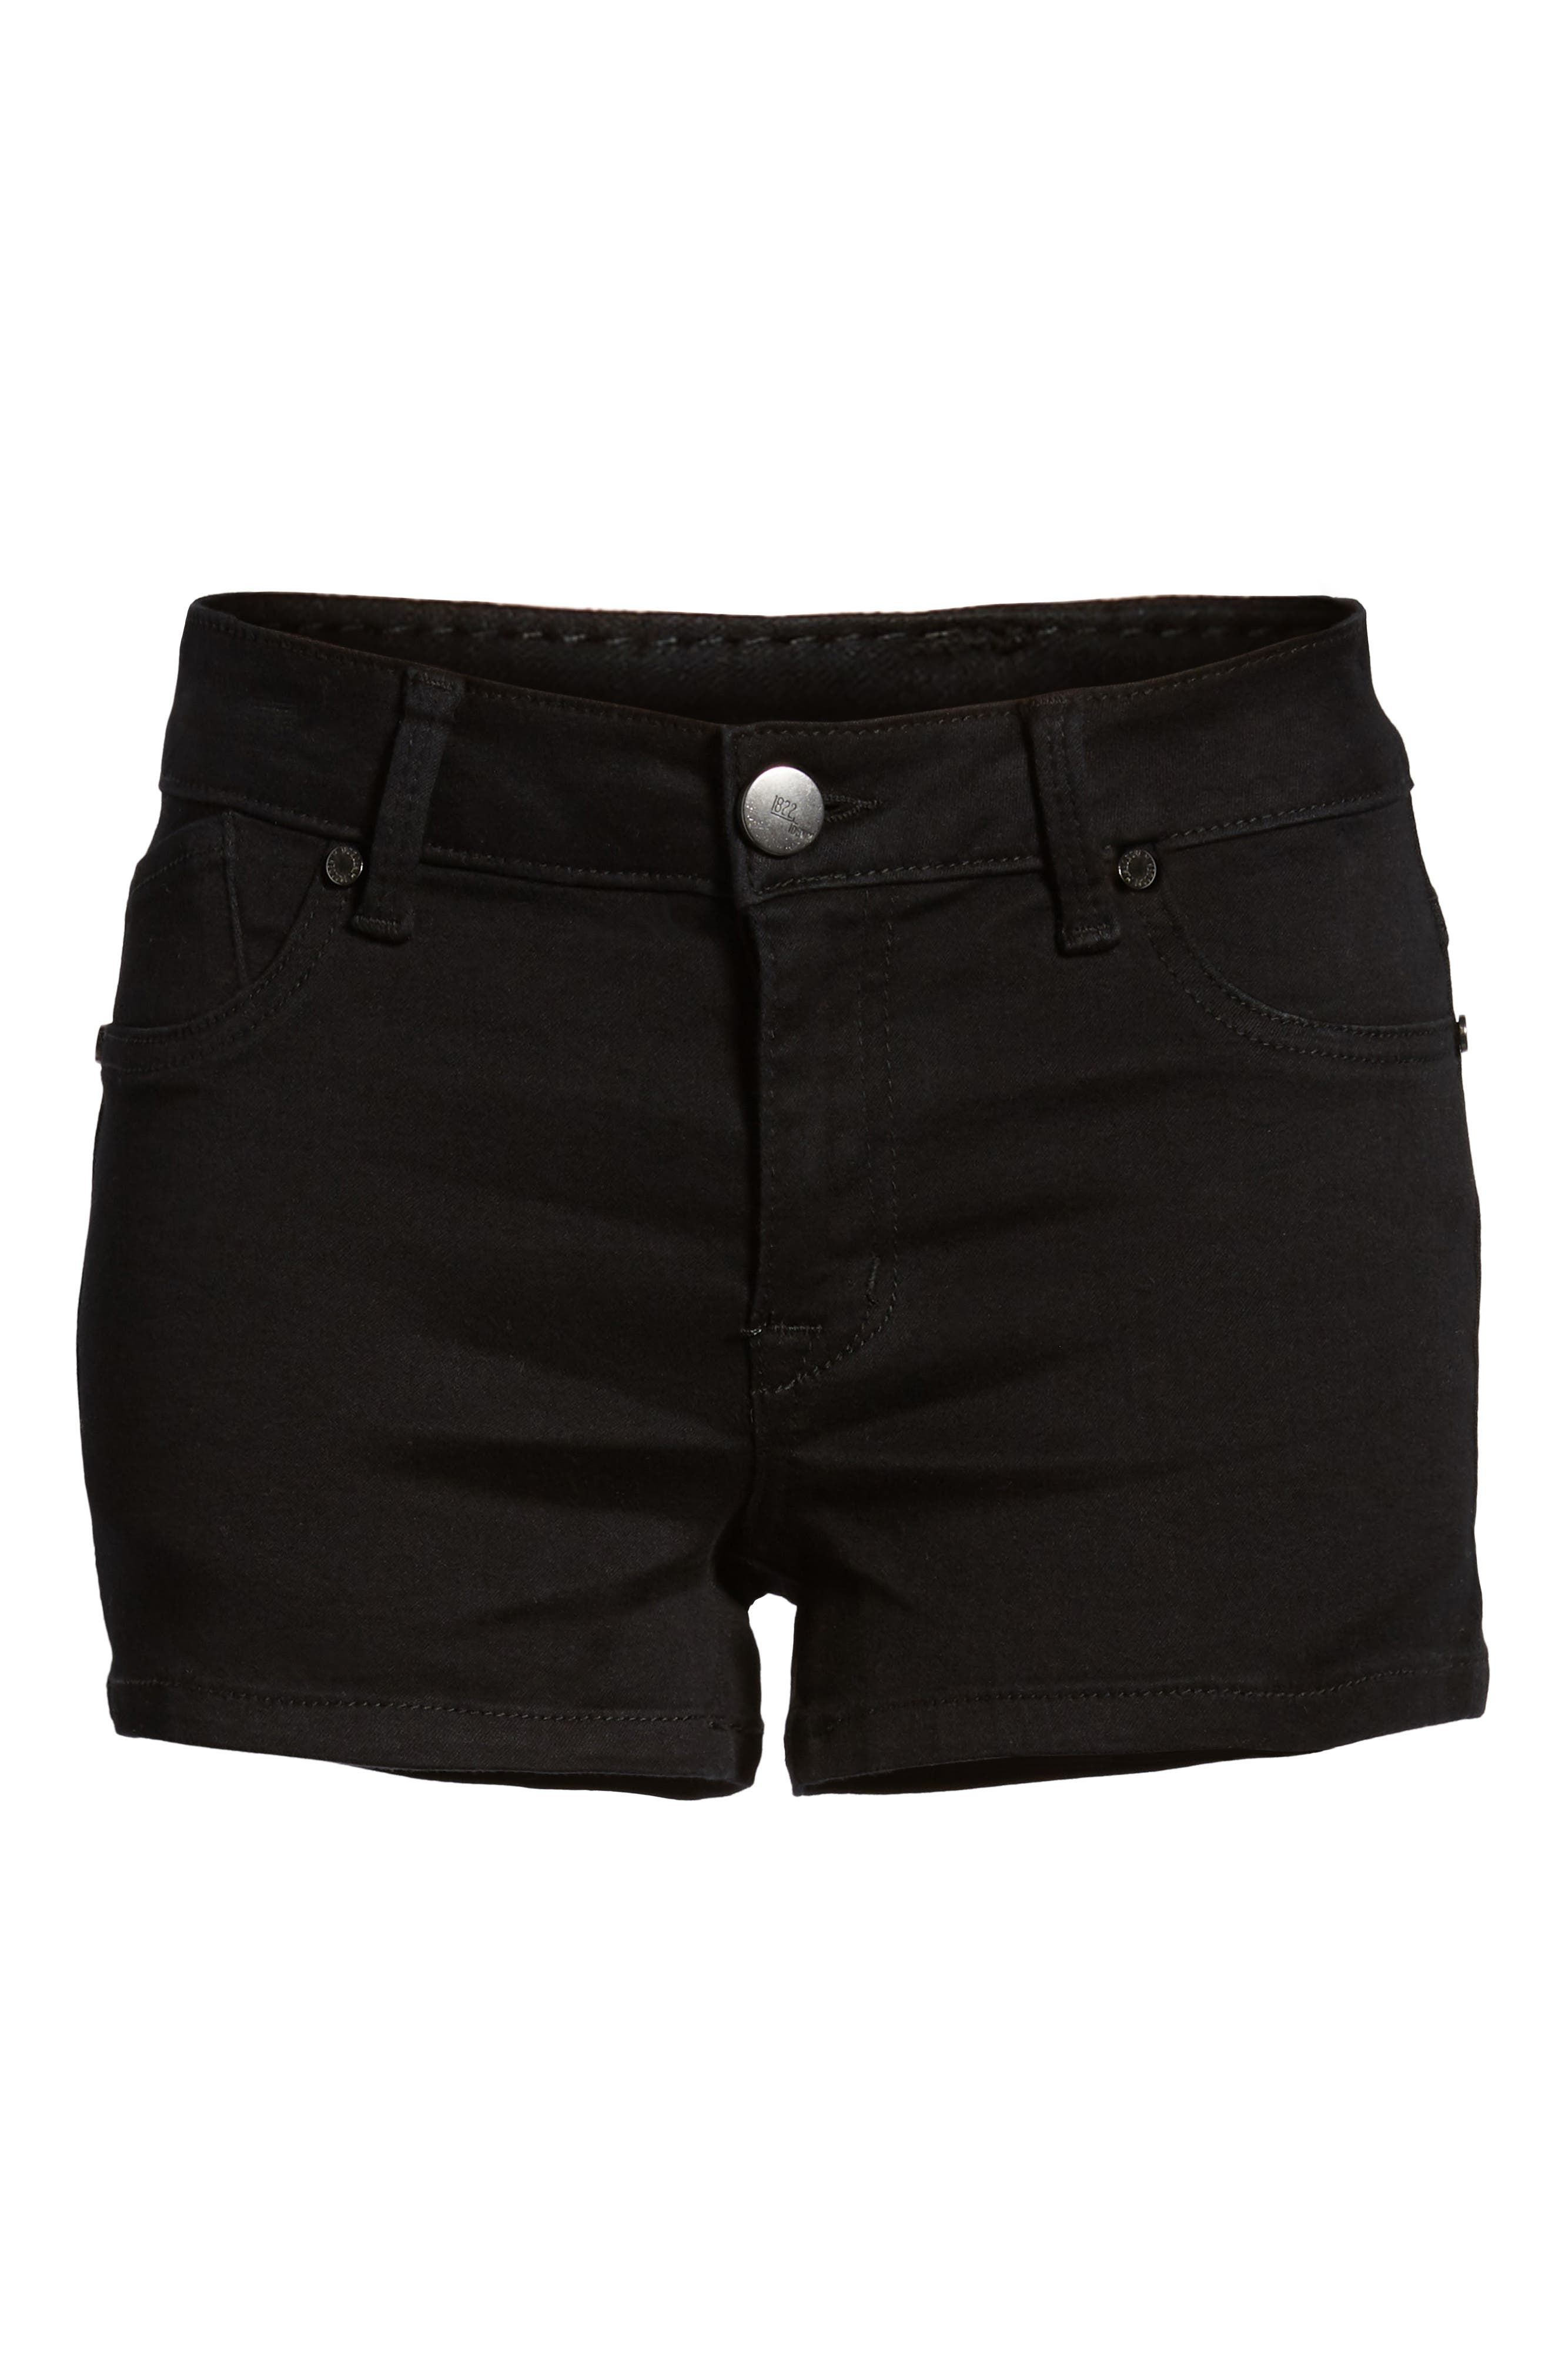 Butter Denim Shorts,                             Alternate thumbnail 7, color,                             001